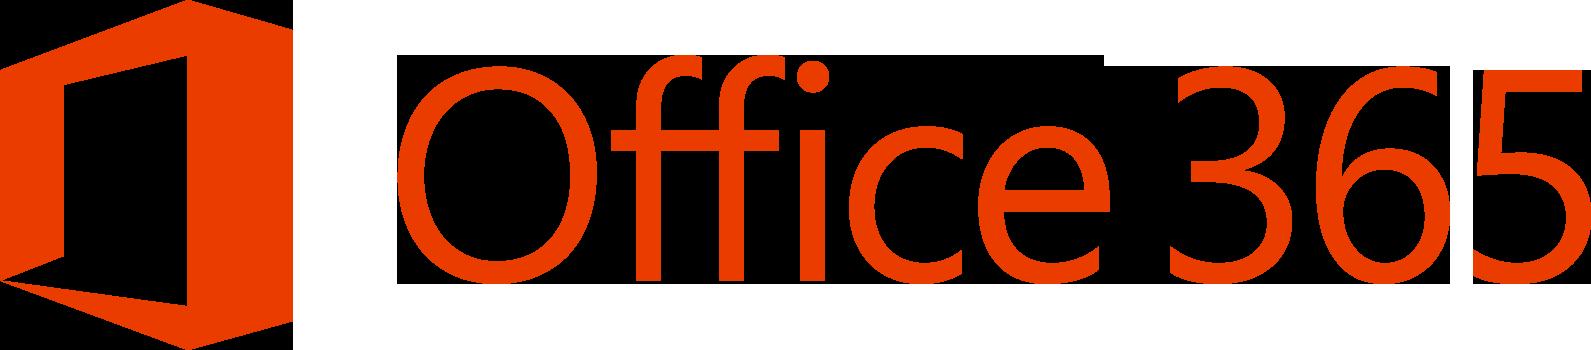 Office365logoOrange_Print.png